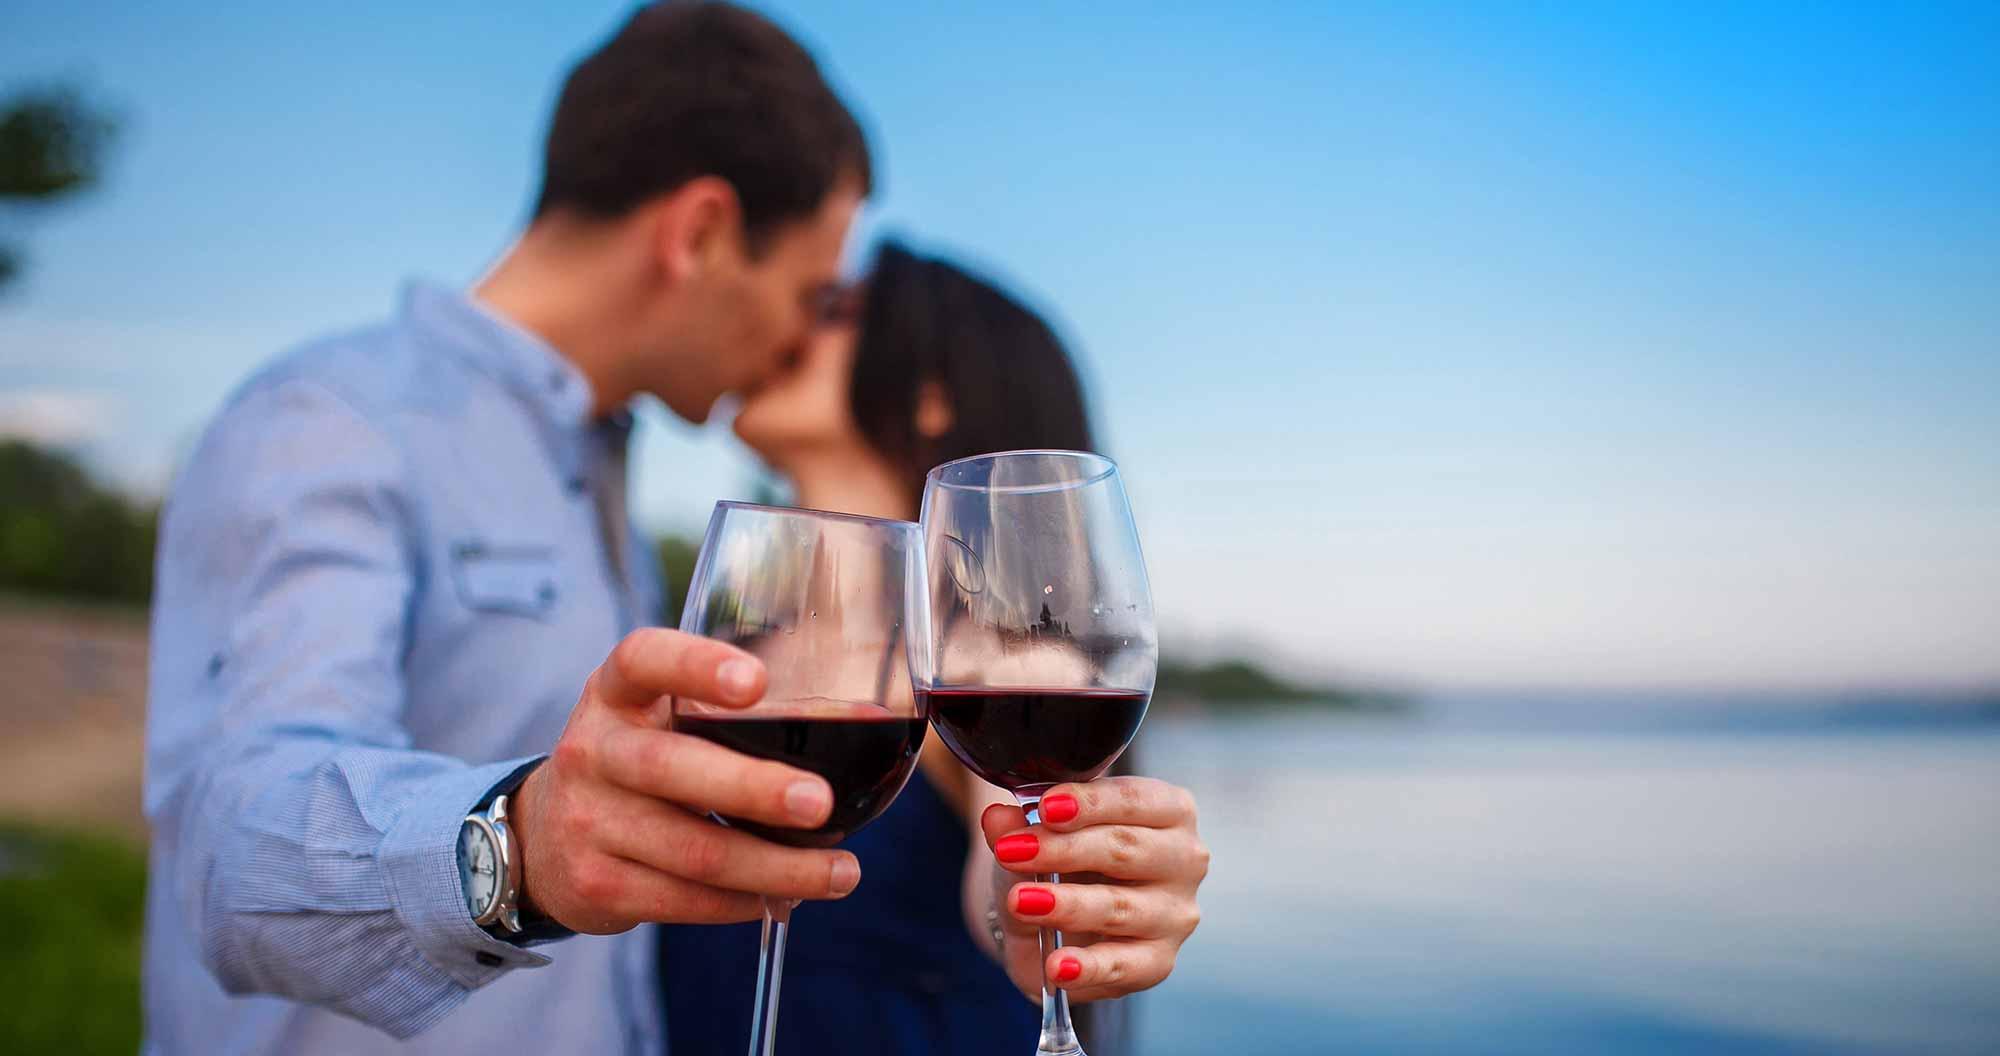 Southern Australia - Wine